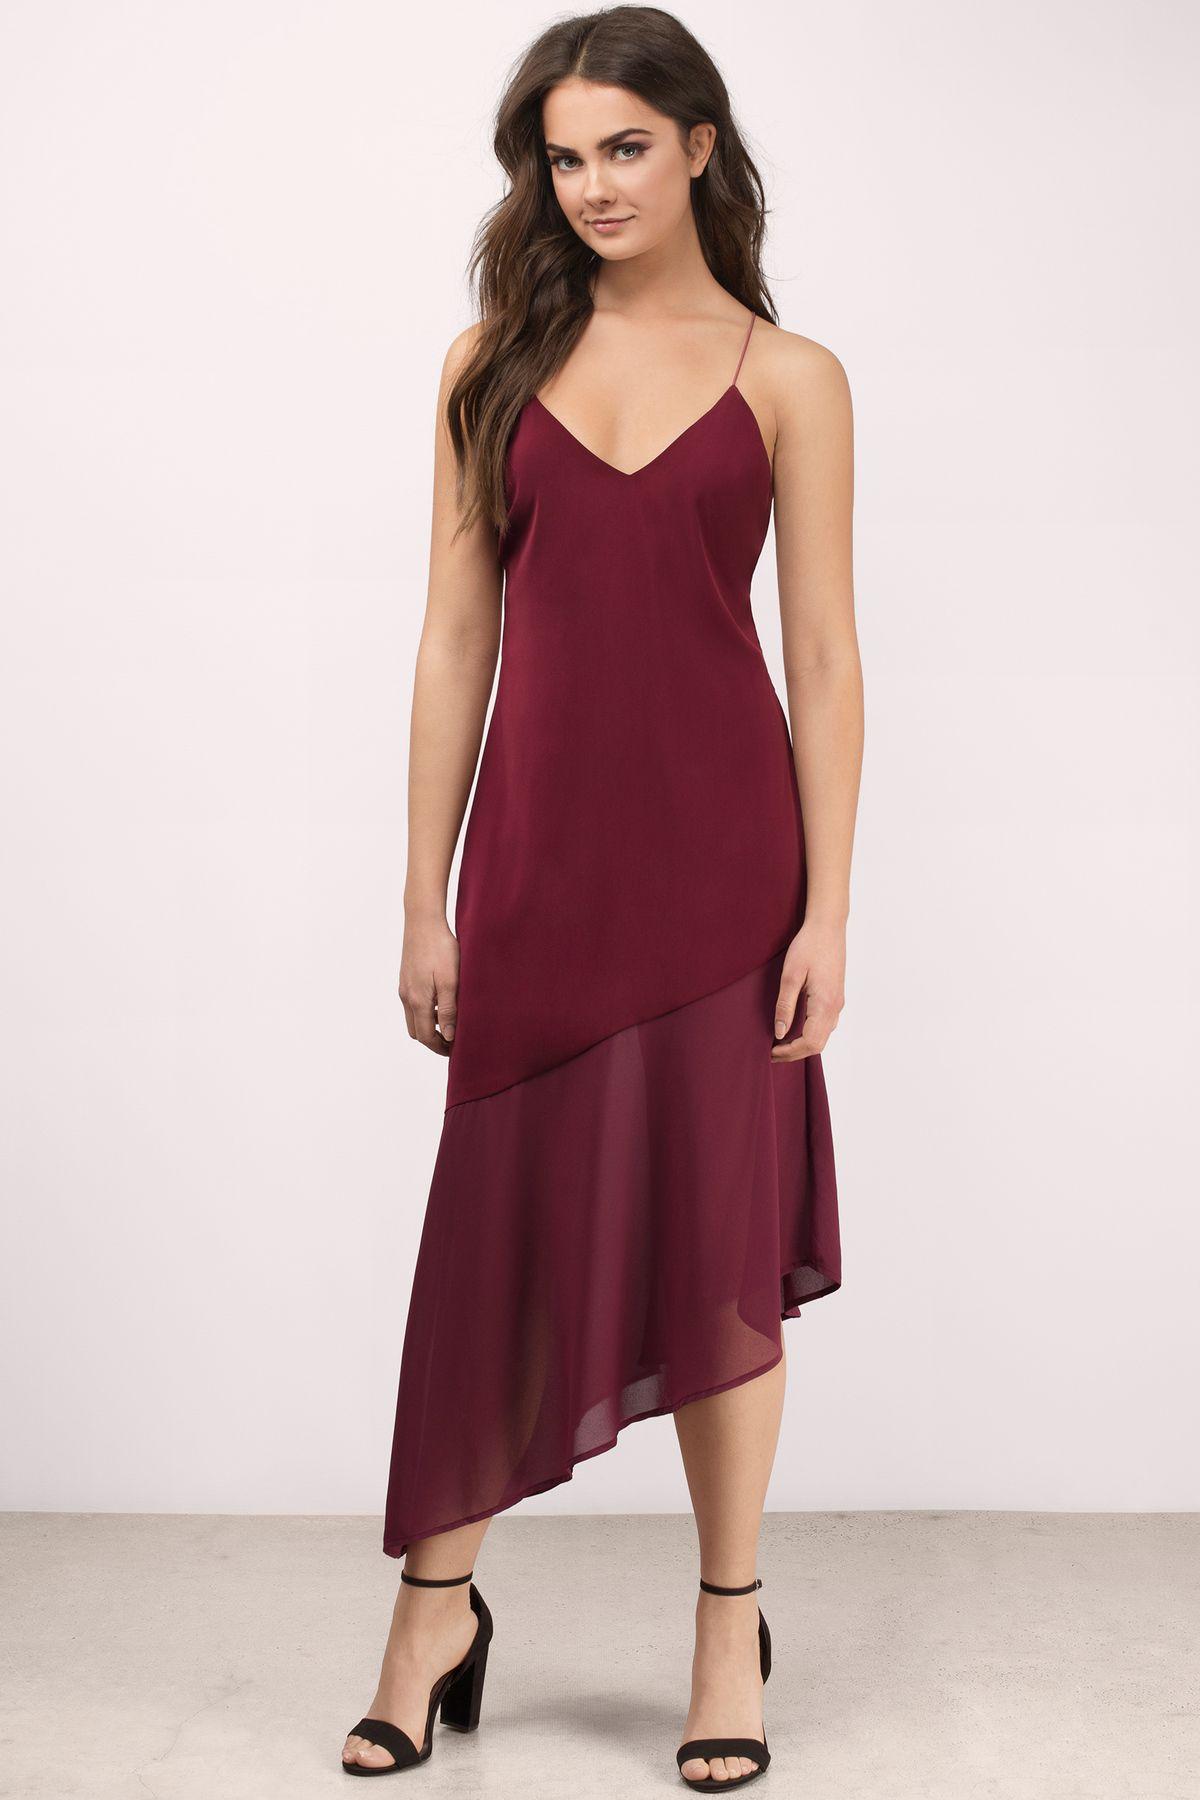 Two Of A Kind Midi Dress In Wine In 2021 A Line Prom Dresses Dresses Petite Prom Dress [ 1800 x 1200 Pixel ]